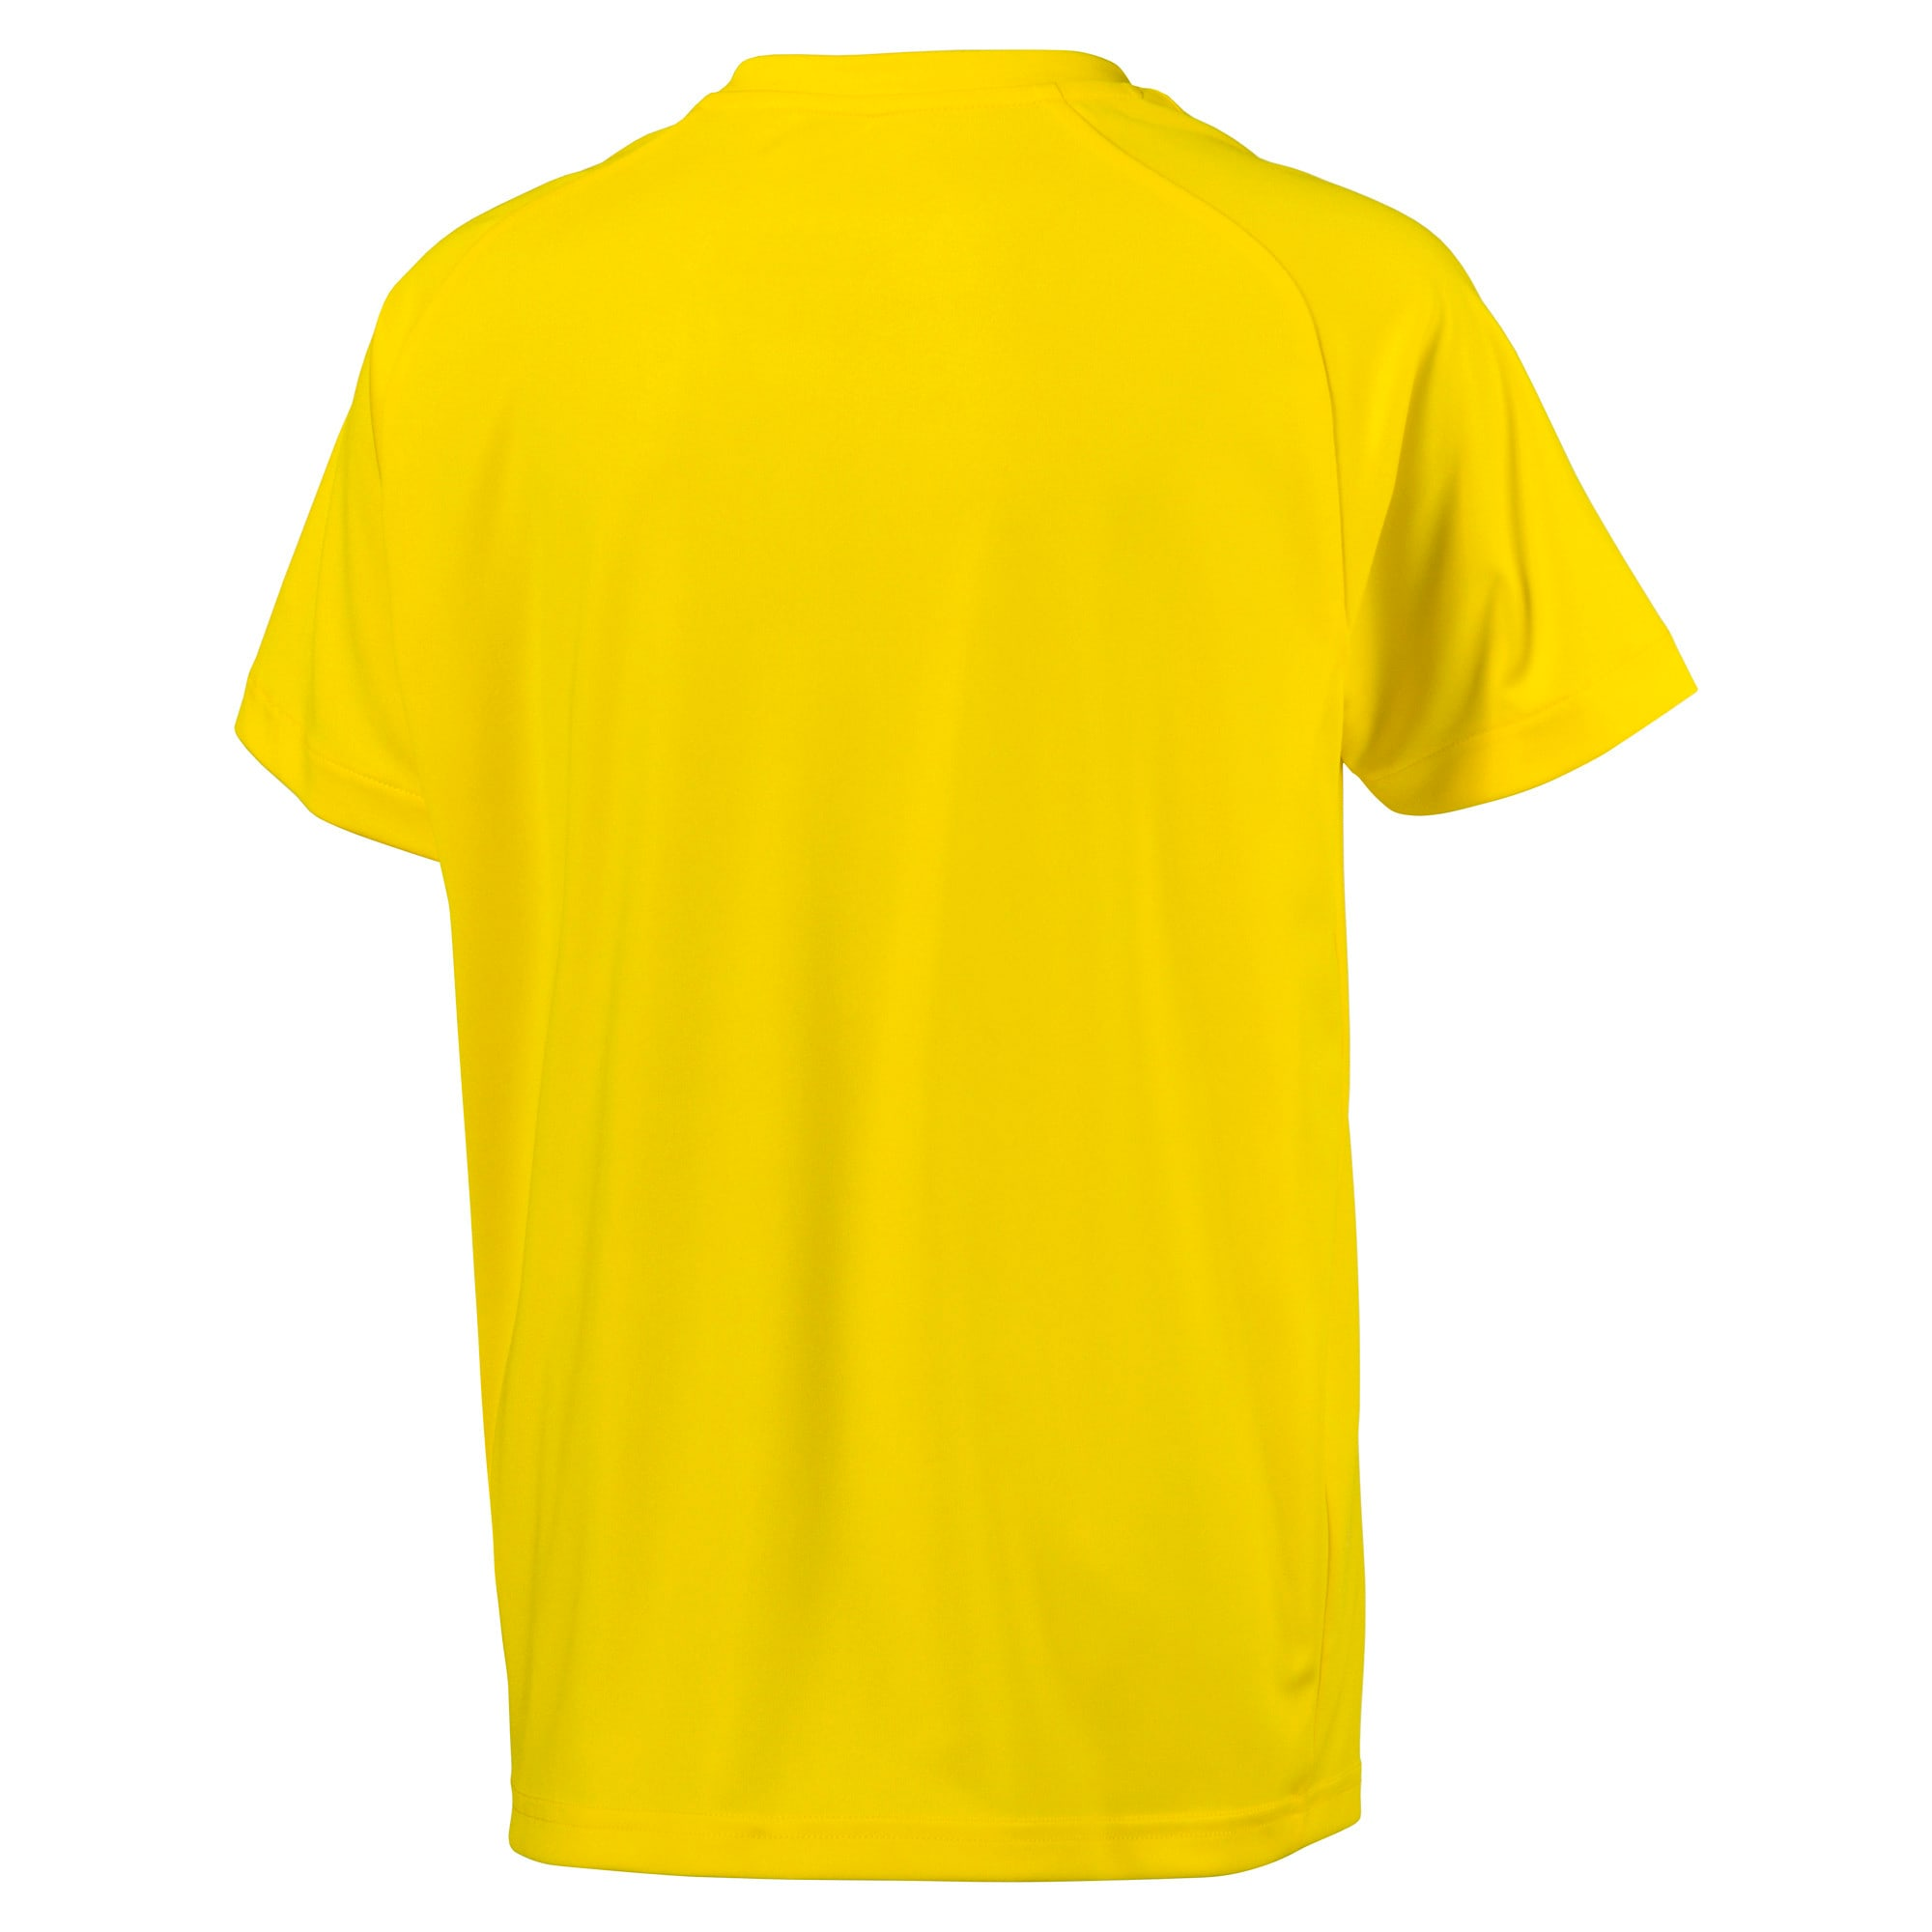 Thumbnail 2 of Maillot Football LIGA Core pour enfant, Cyber Yellow-Puma Black, medium